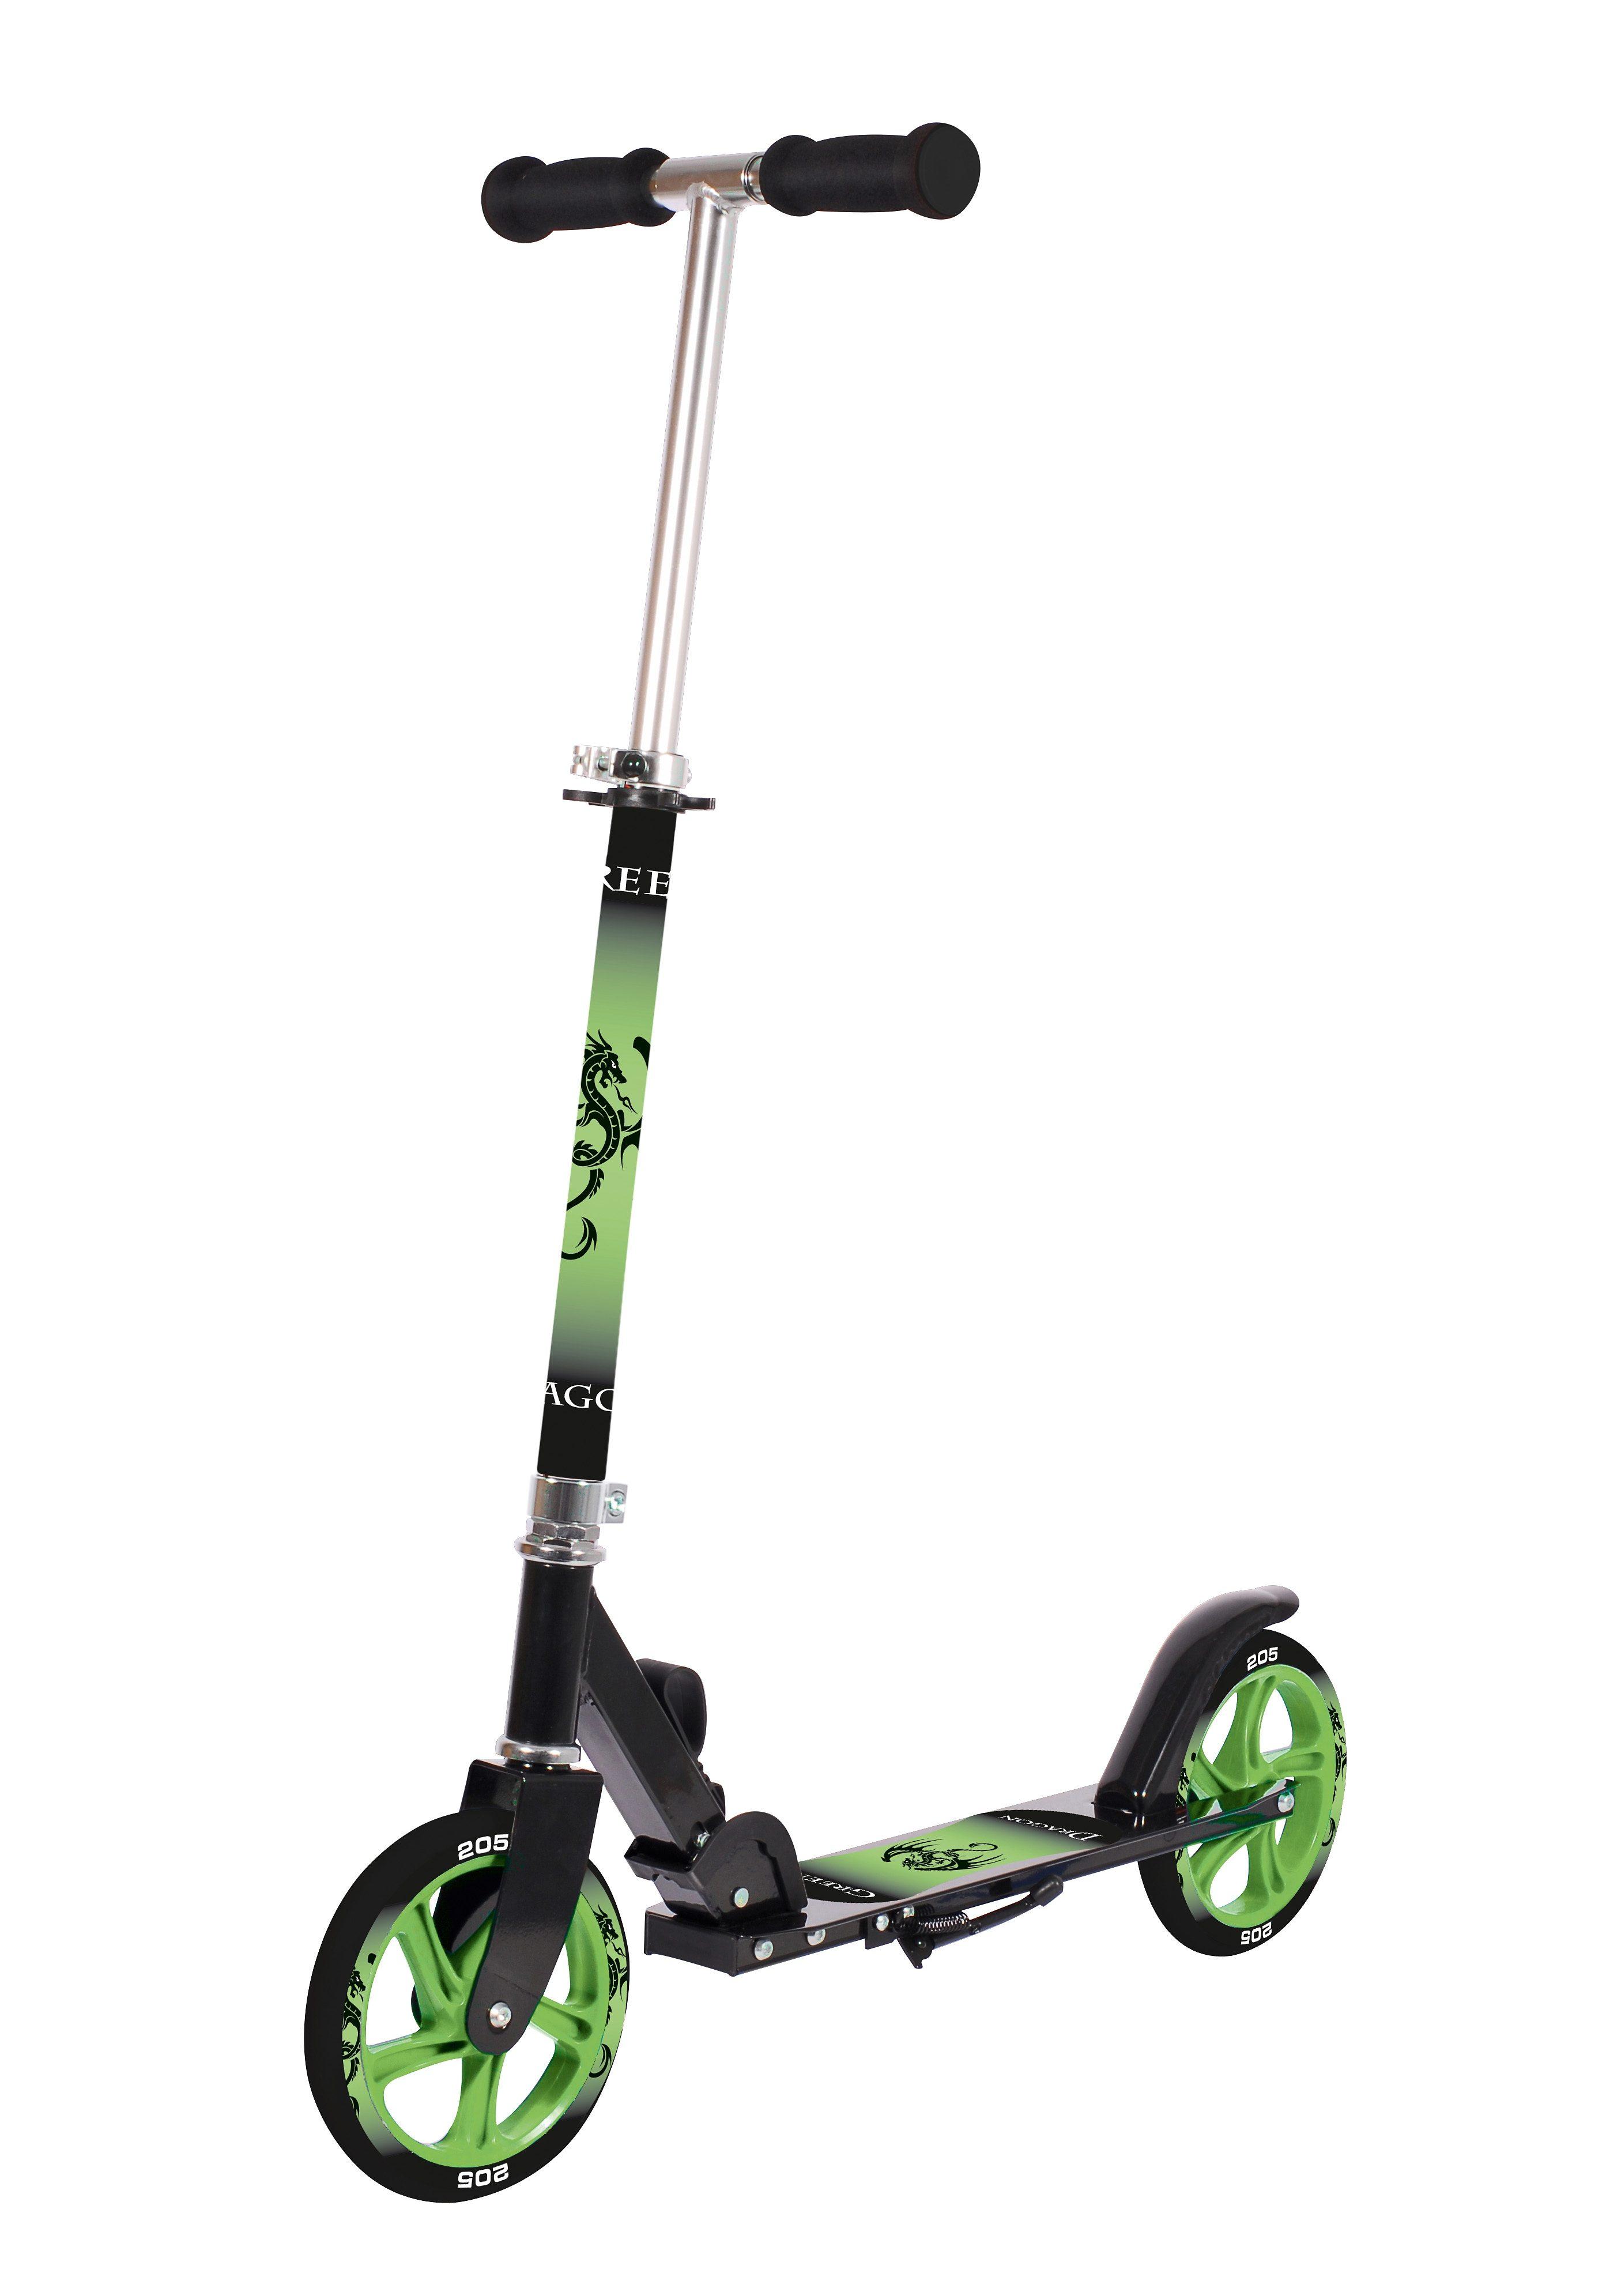 Alu-Cityroller, schwarz-grün, »Green Dragon«, Hudora